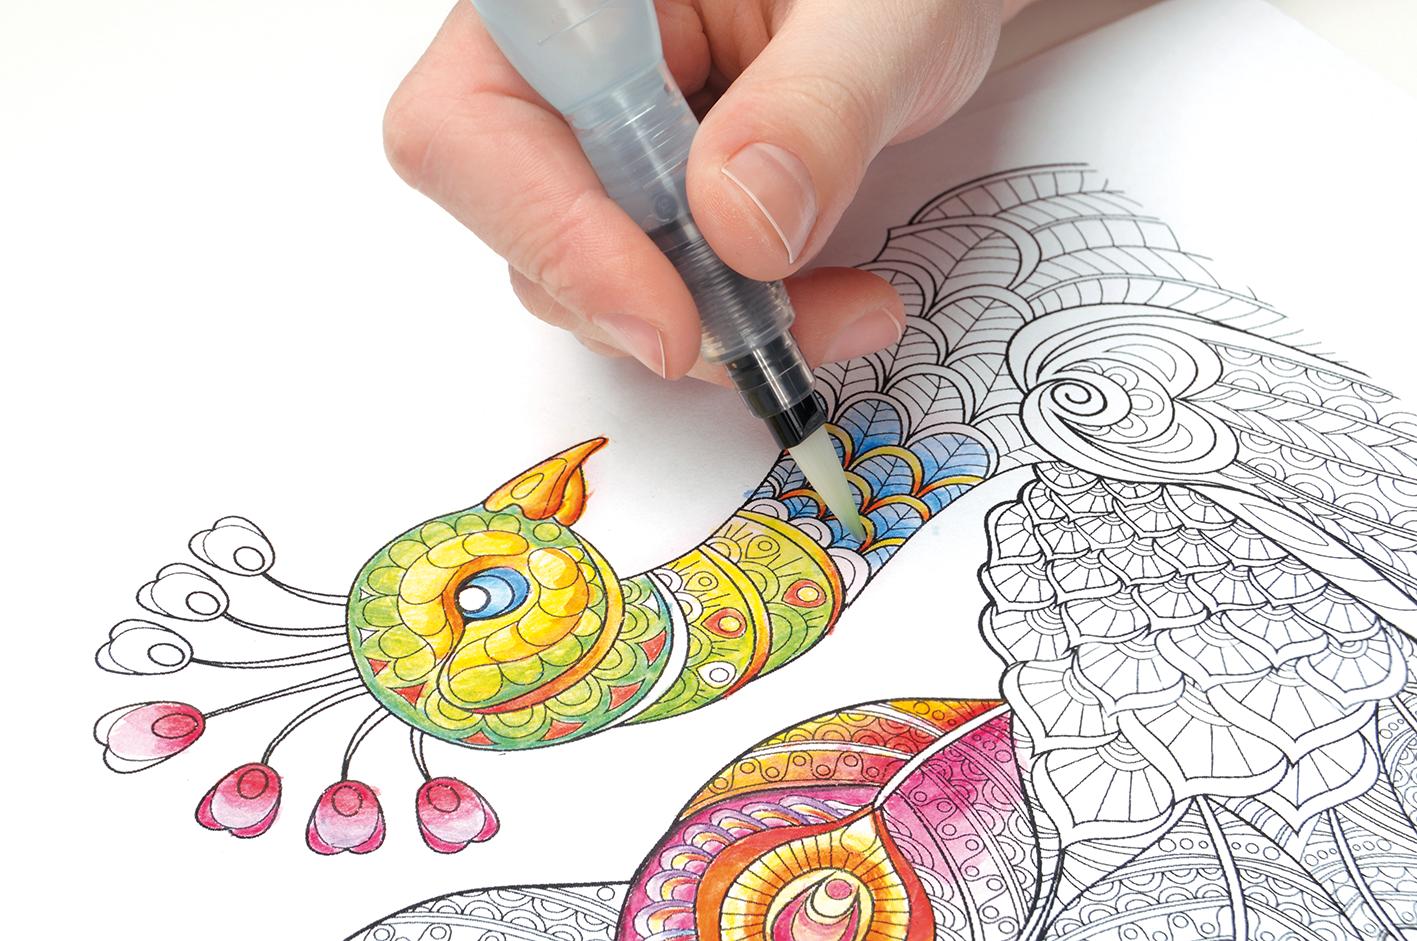 Watercolour Pencils 4